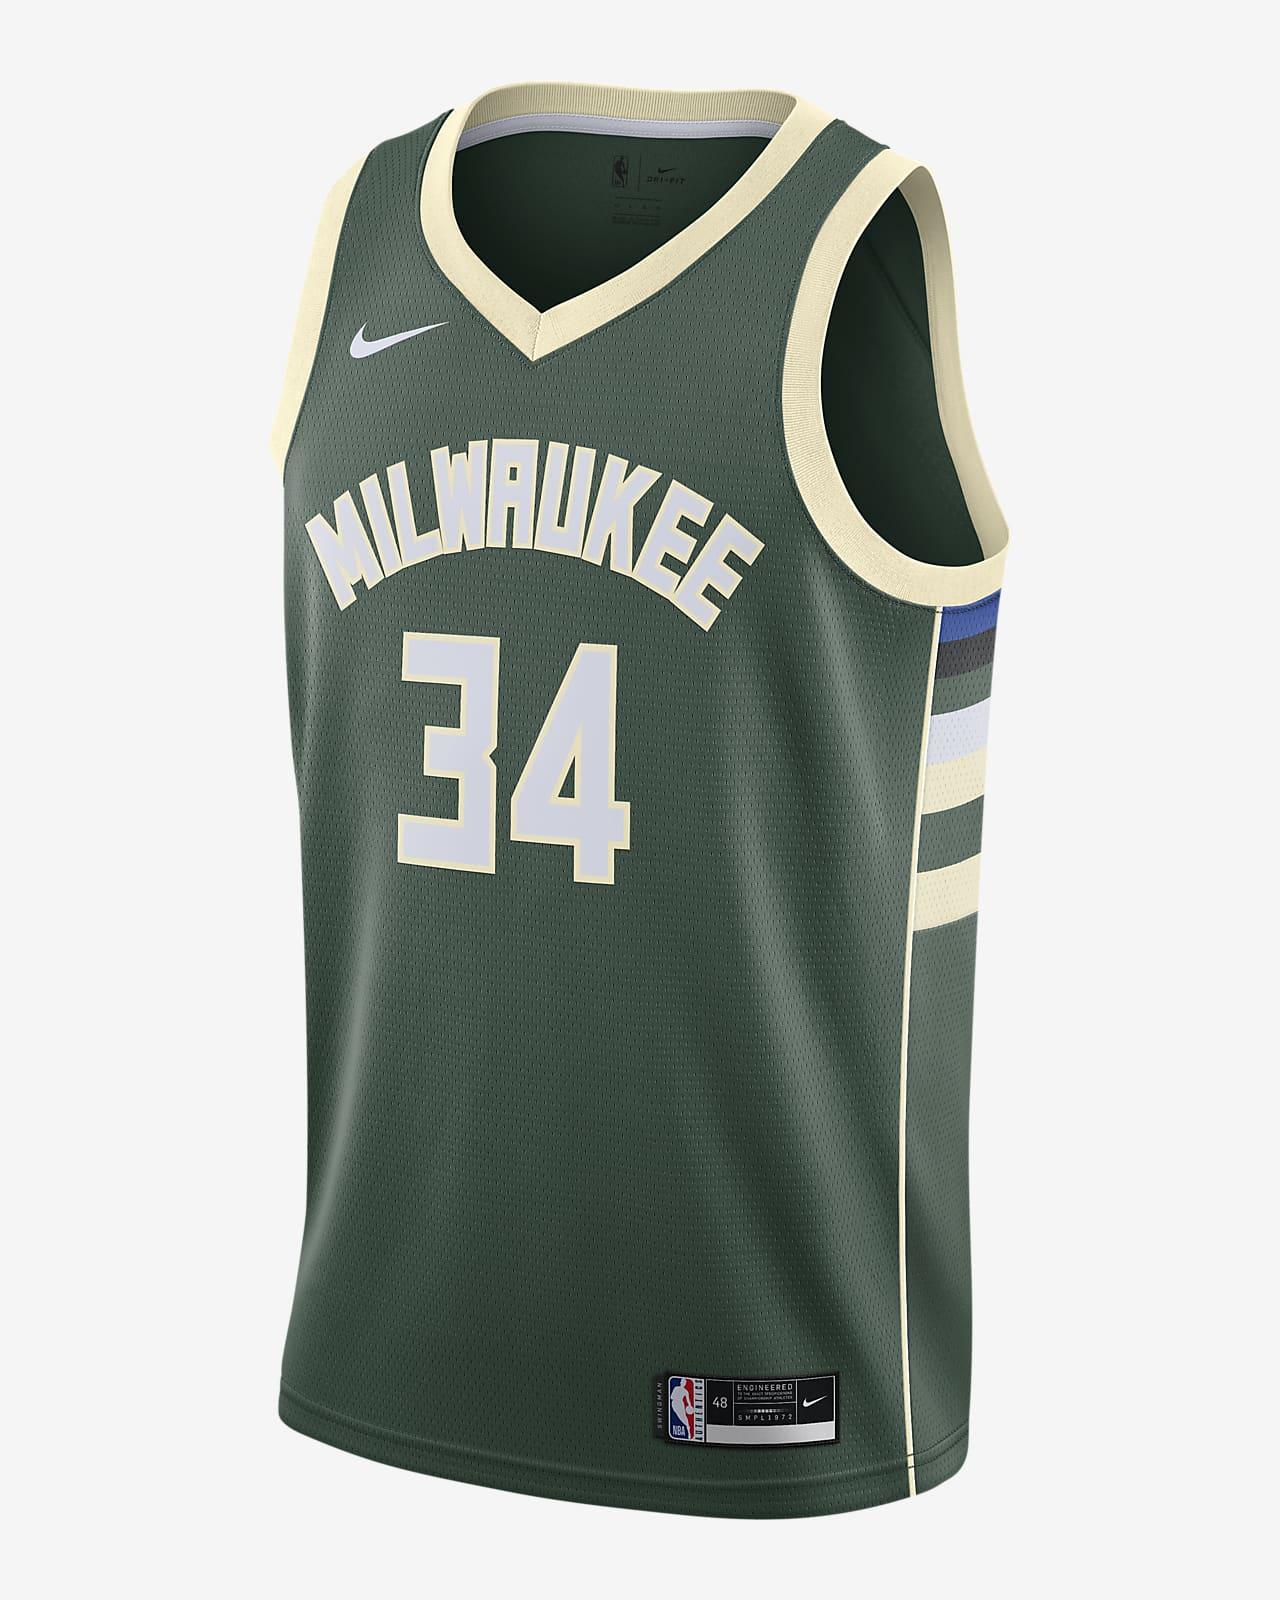 2020 赛季密尔沃基雄鹿队 (Giannis Antetokounmpo) Icon Edition Nike NBA Swingman Jersey 男子球衣